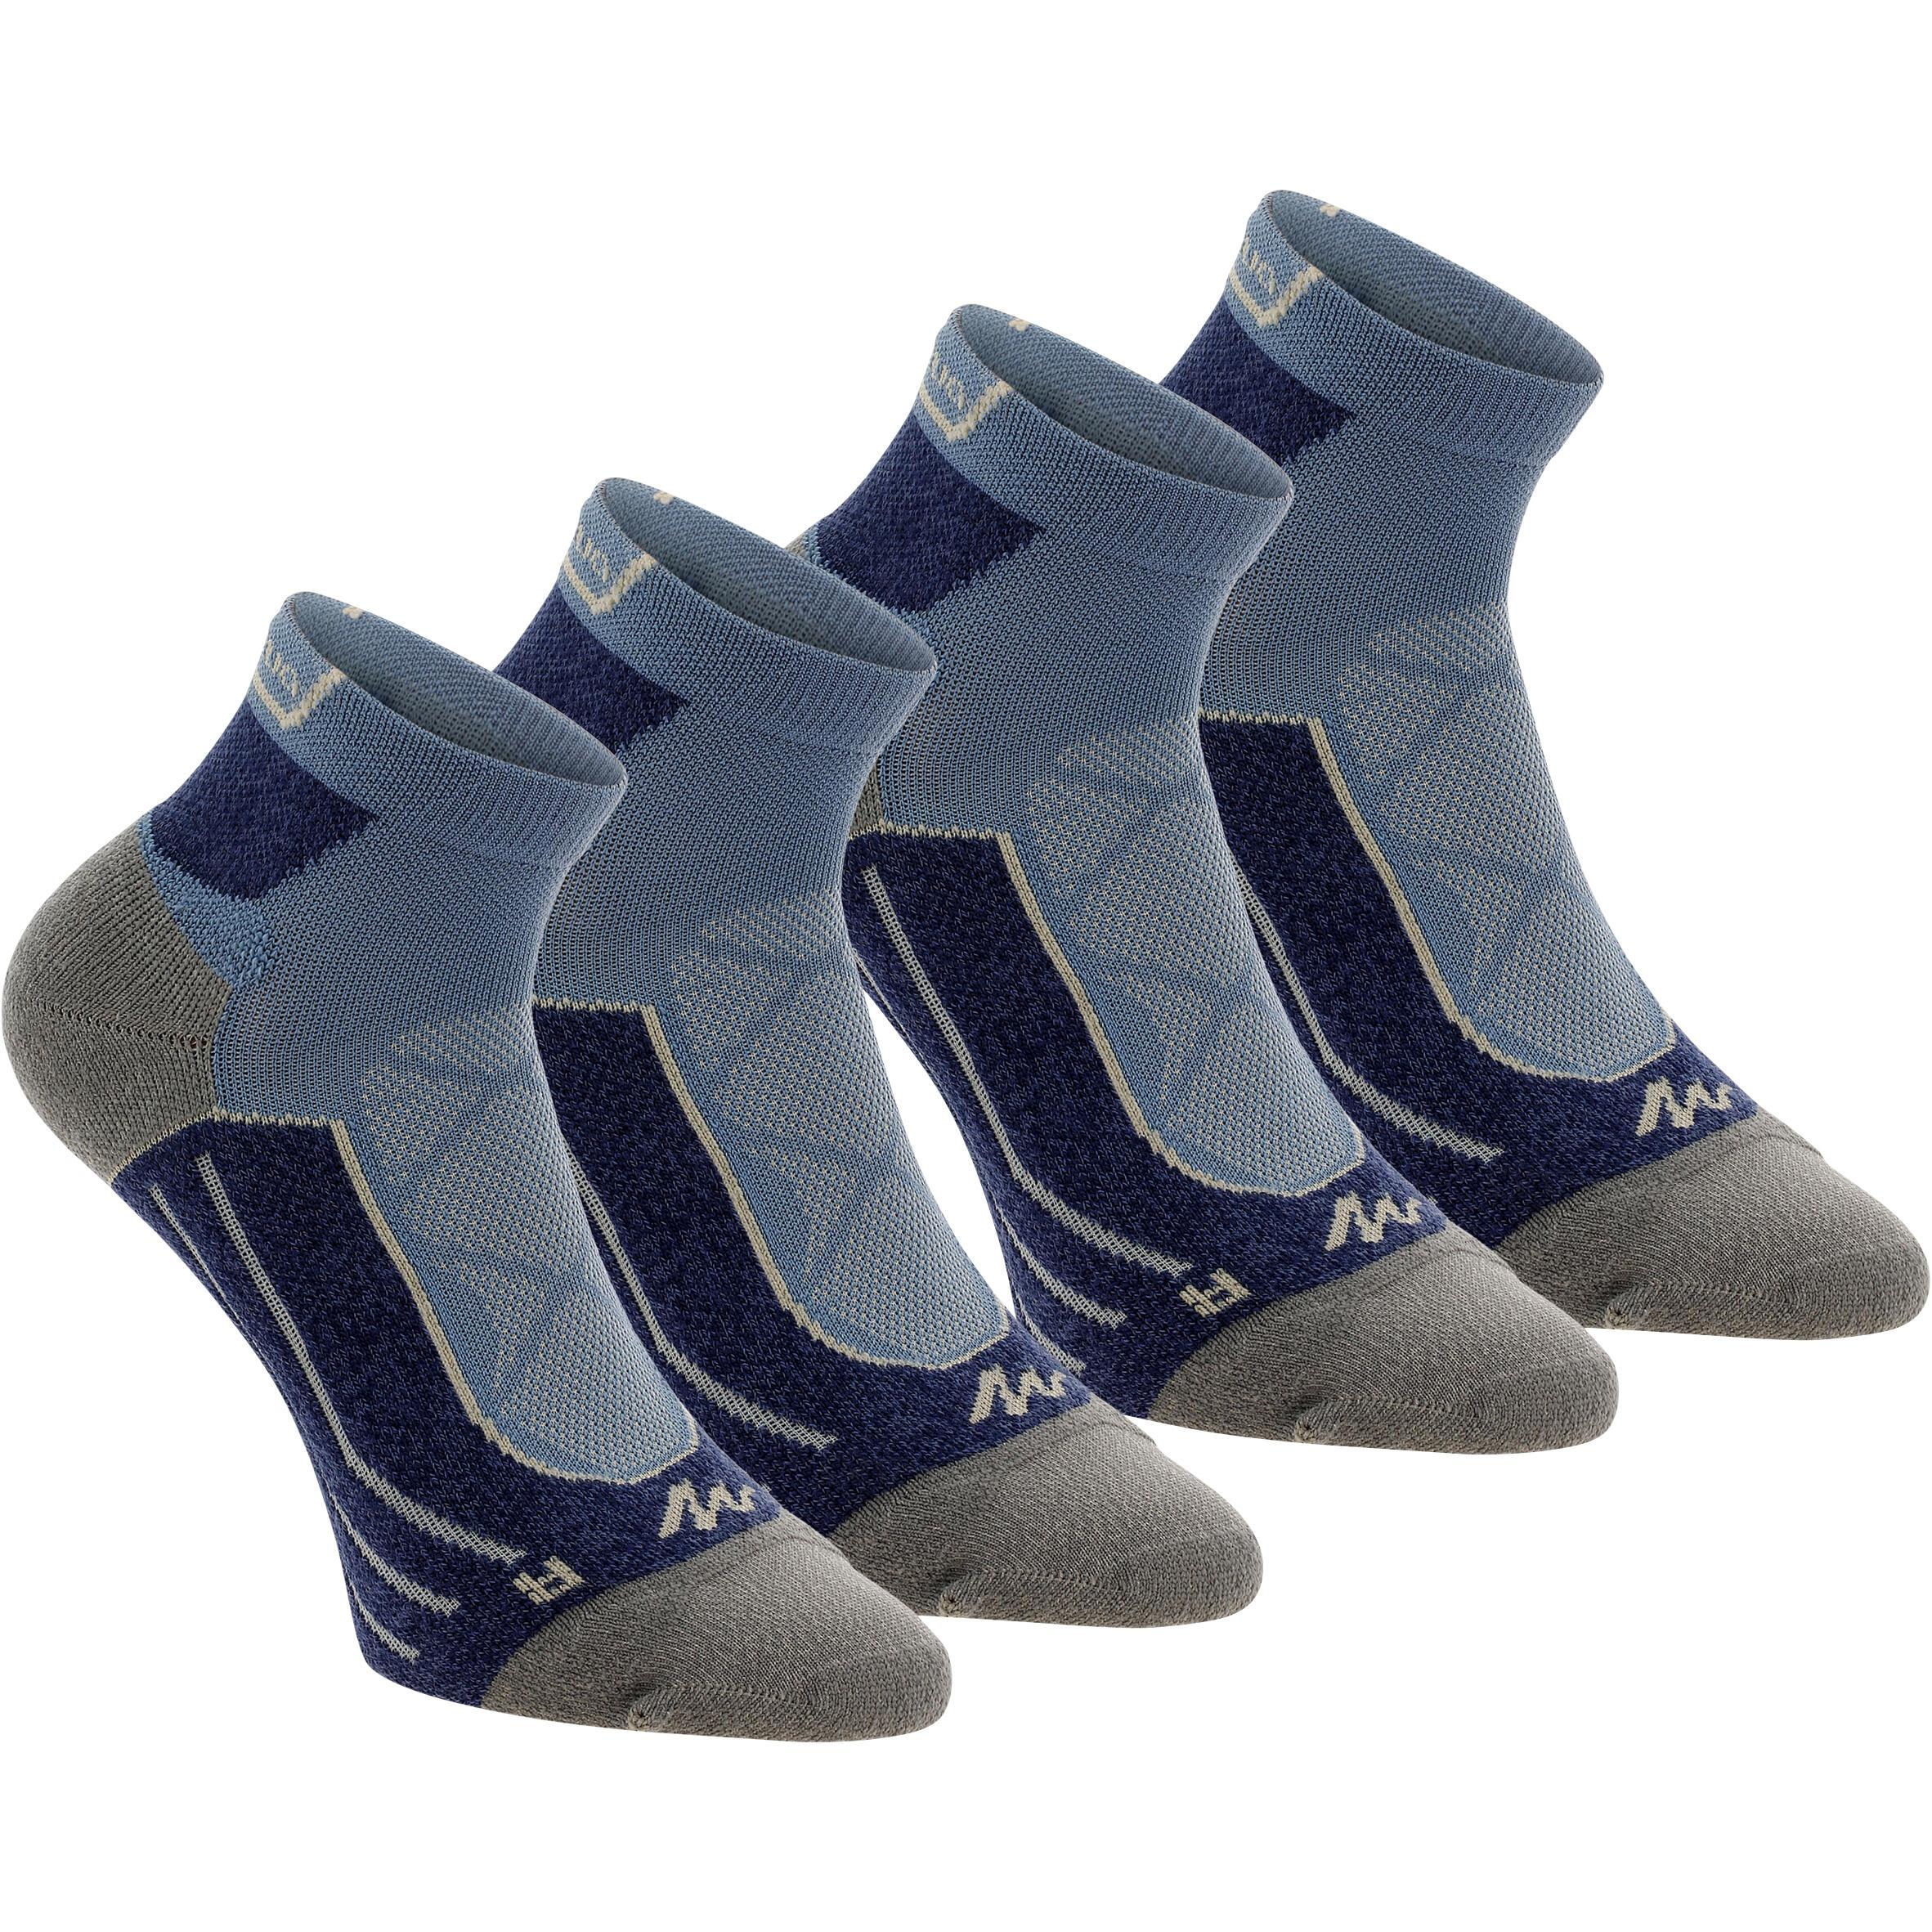 Wandersocken Bergwandern MH900 Mid 2 Paar, blau/grau. | Sportbekleidung > Funktionswäsche > Wandersocken | Grau - Blau | Quechua